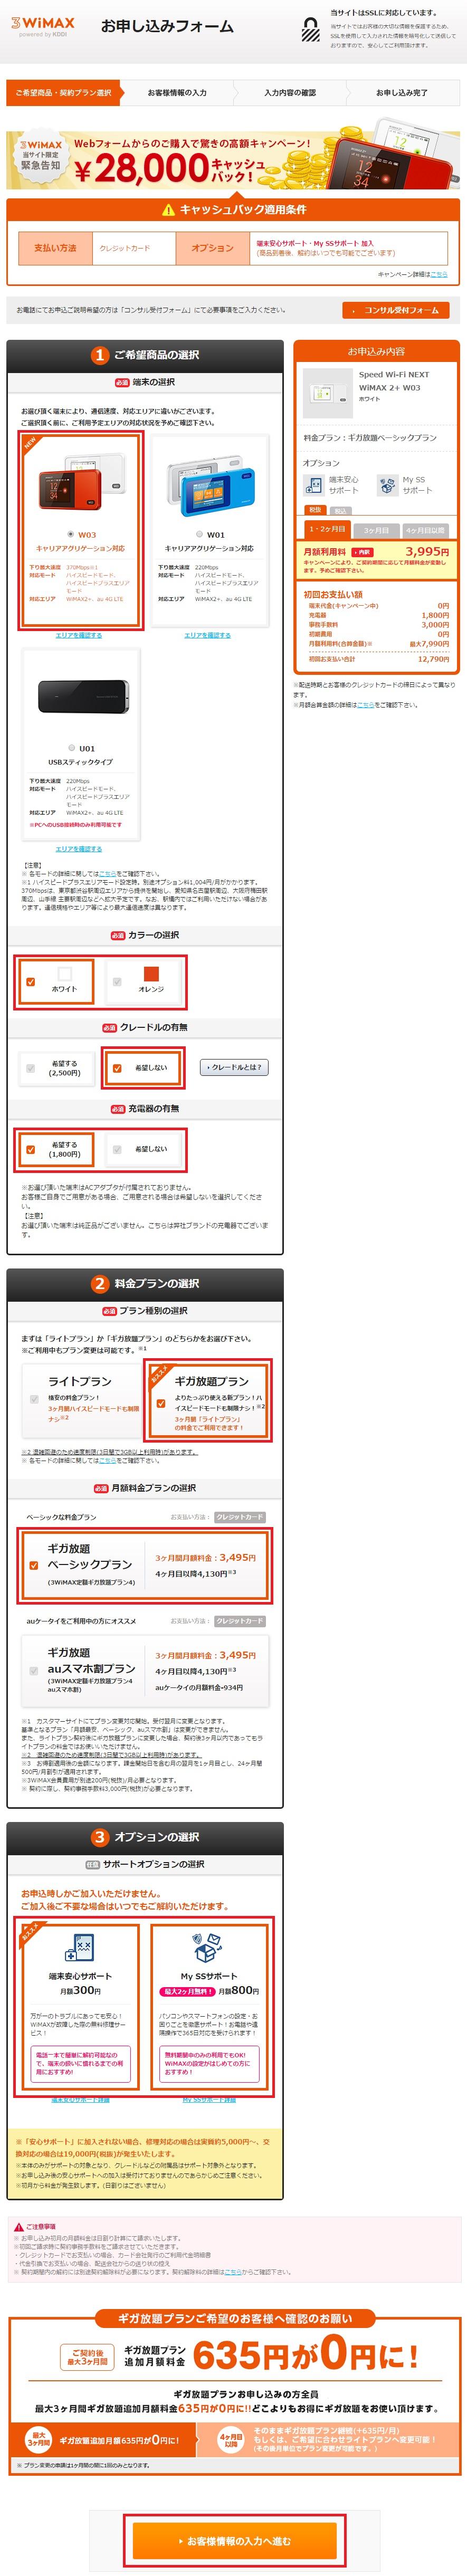 WiMAXマスター3WiMAX契約方法と手順22016年8月11日